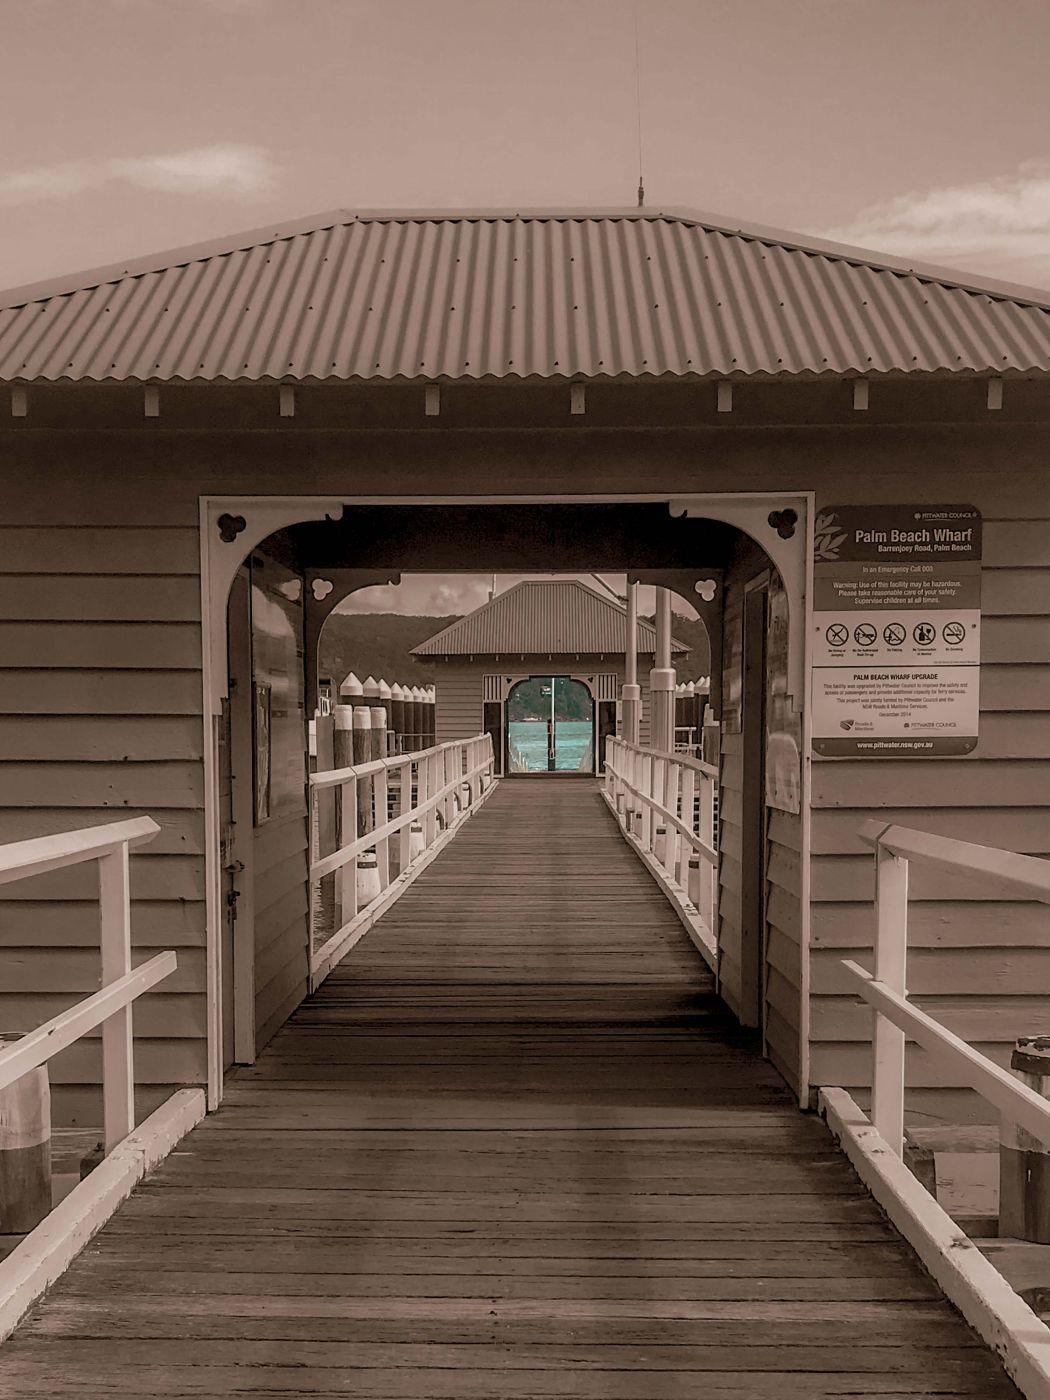 Palm Beach Wharf Sydney New South Wales, Australia